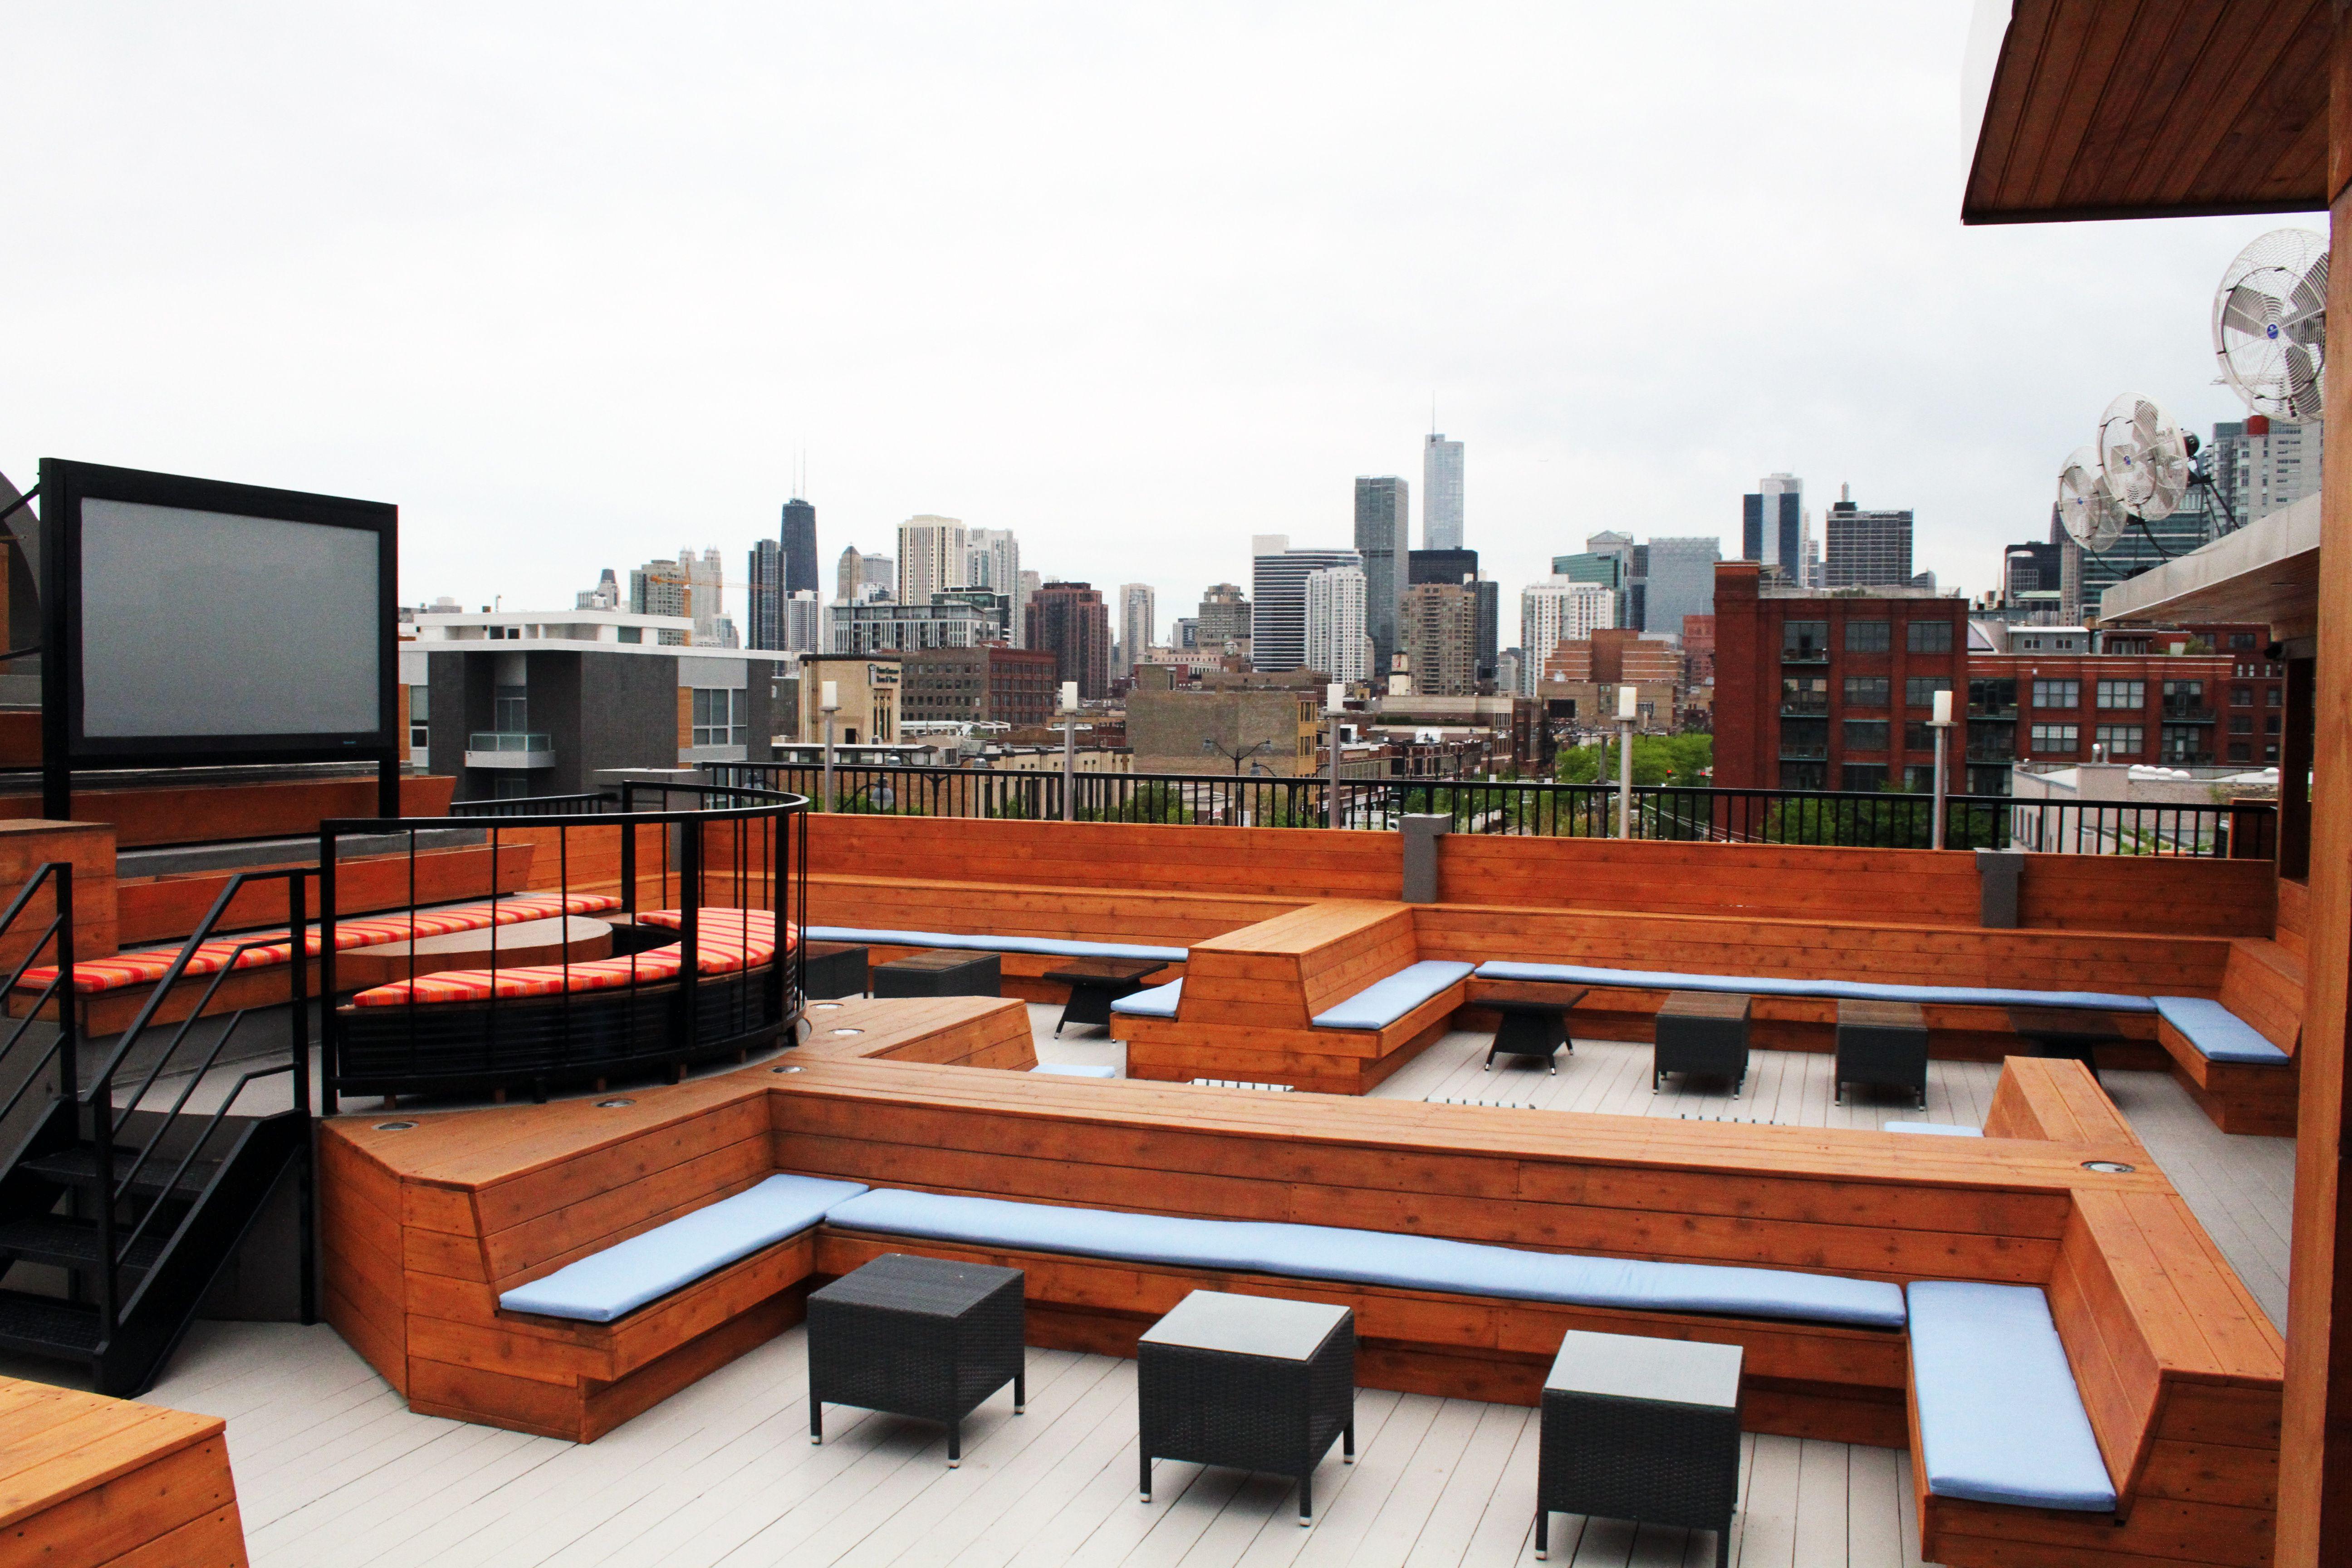 Big Screen On Roof Roofing Backyard Rooftop Bar